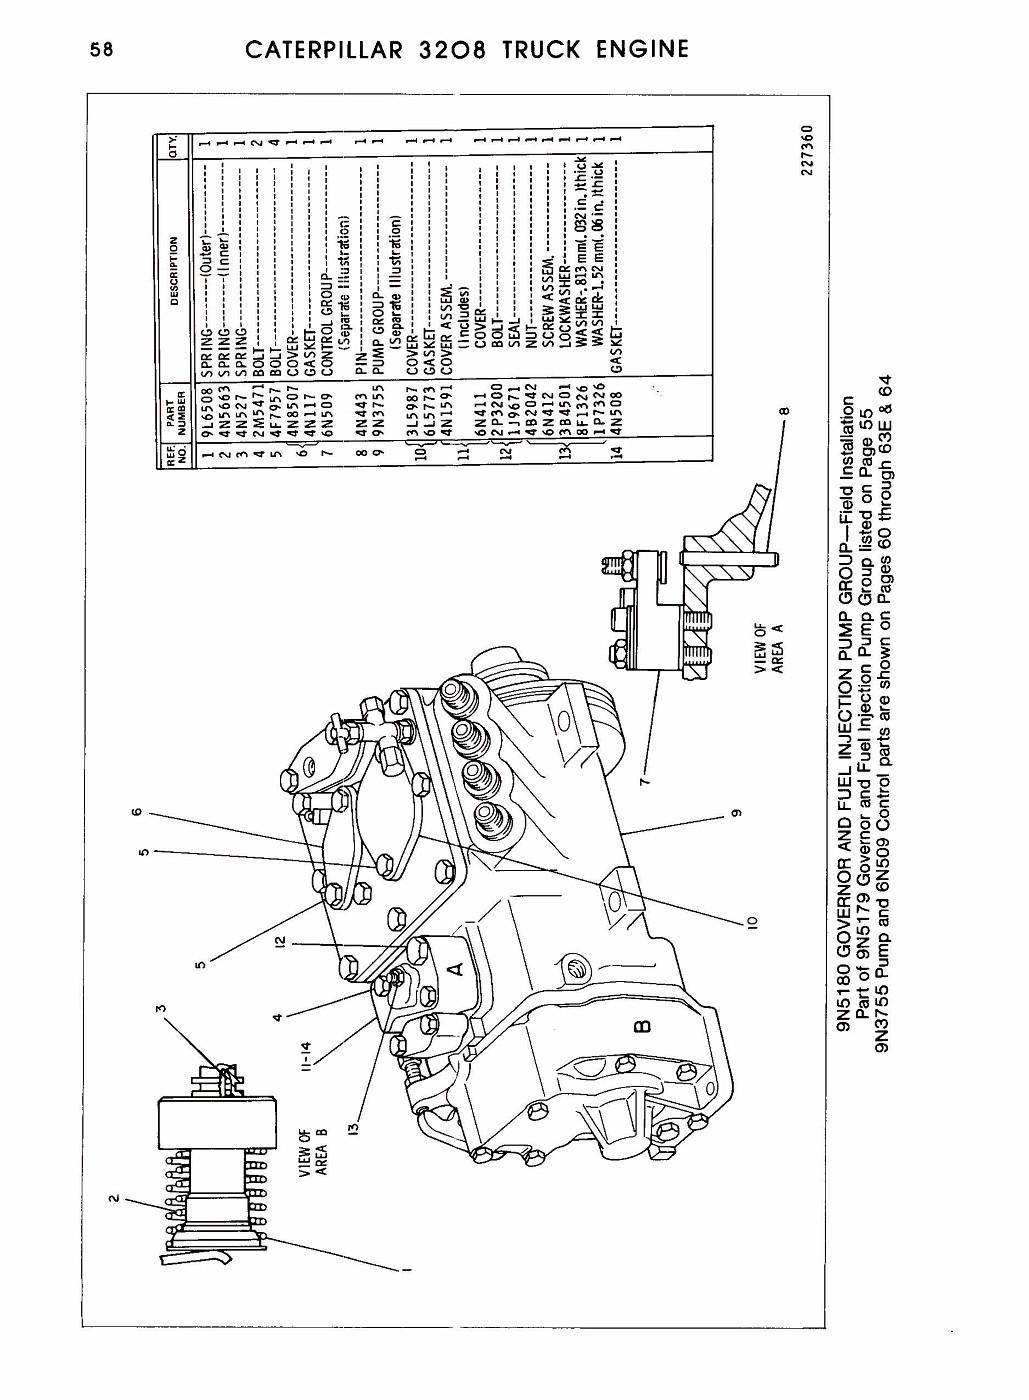 Photo: 3208 Parts Manual Pagina 118 | CAT 3208 dieselengine parts manual  album | modeltrucks25 | Fotki.com, photo and video sharing made easy.Fotki